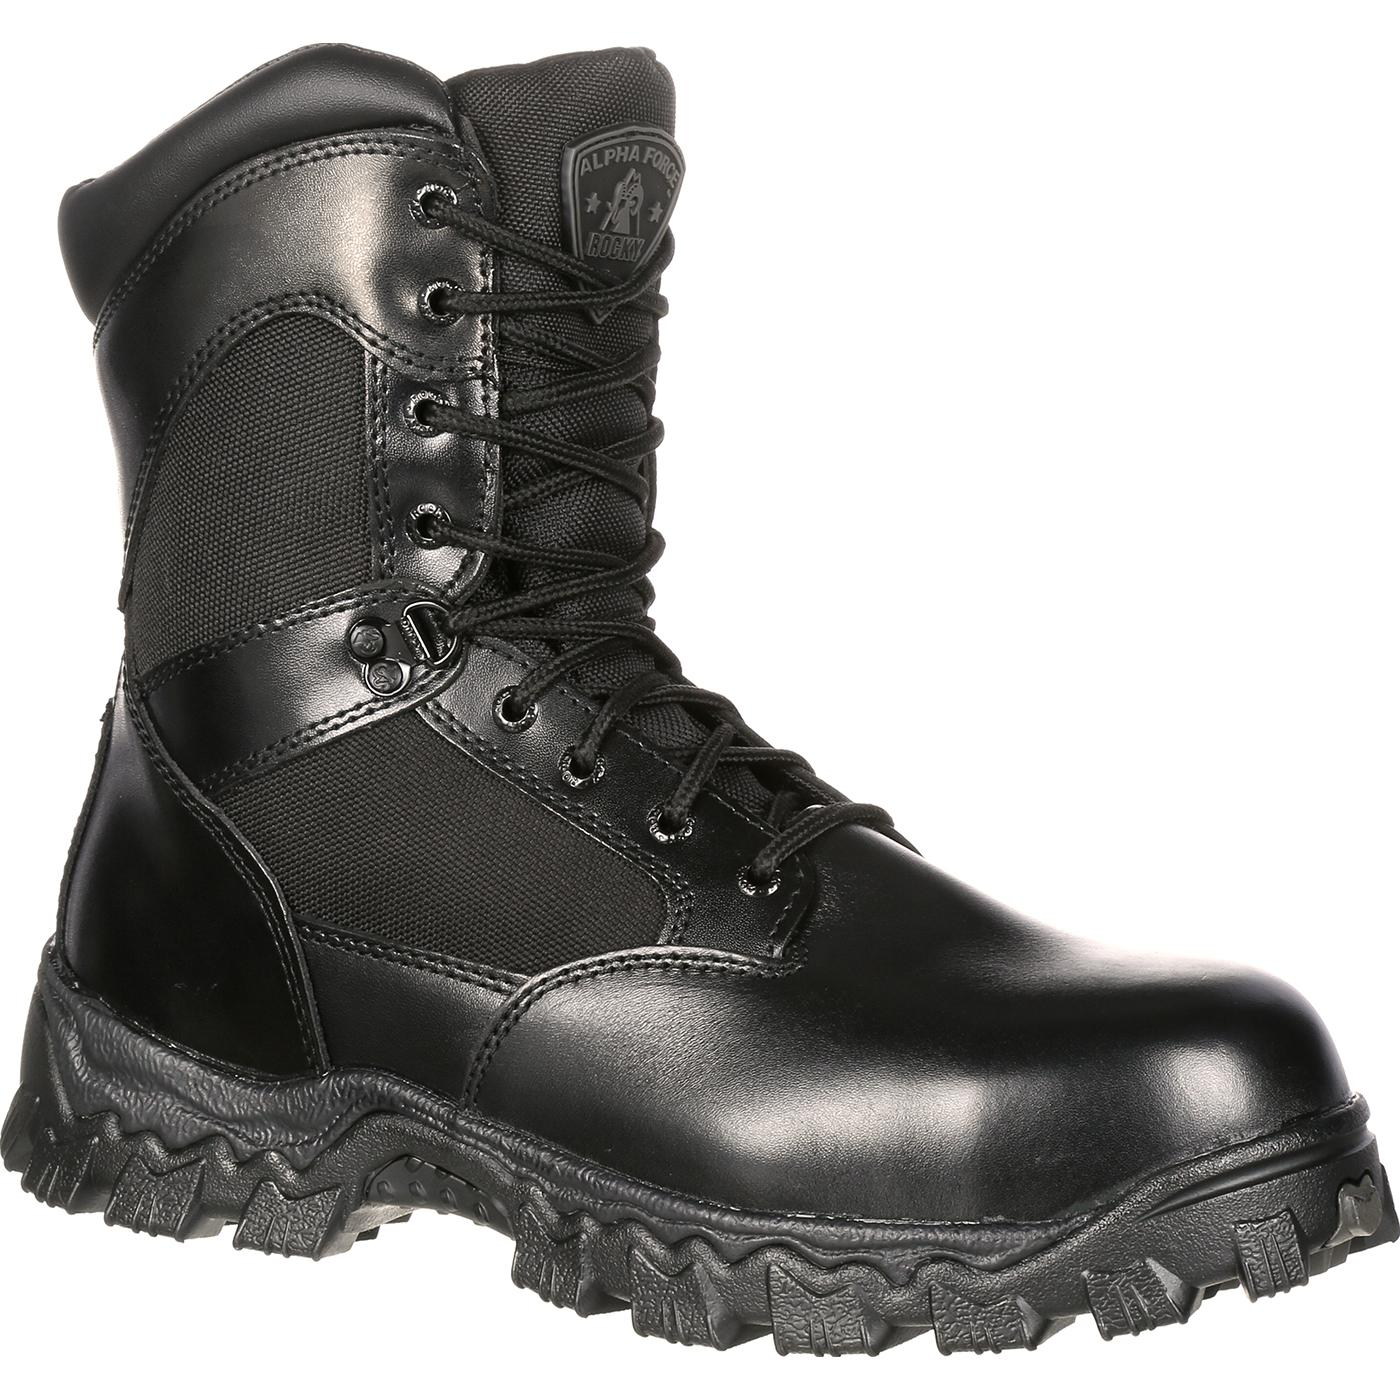 Fall/Winter Mens Rocky 6 AlphaForce Composite Toe Waterproof Boot Brown Full Grain Leather/Nylon Mens Brown Full Grain Leather/Nylon Rocky Mens Rocky